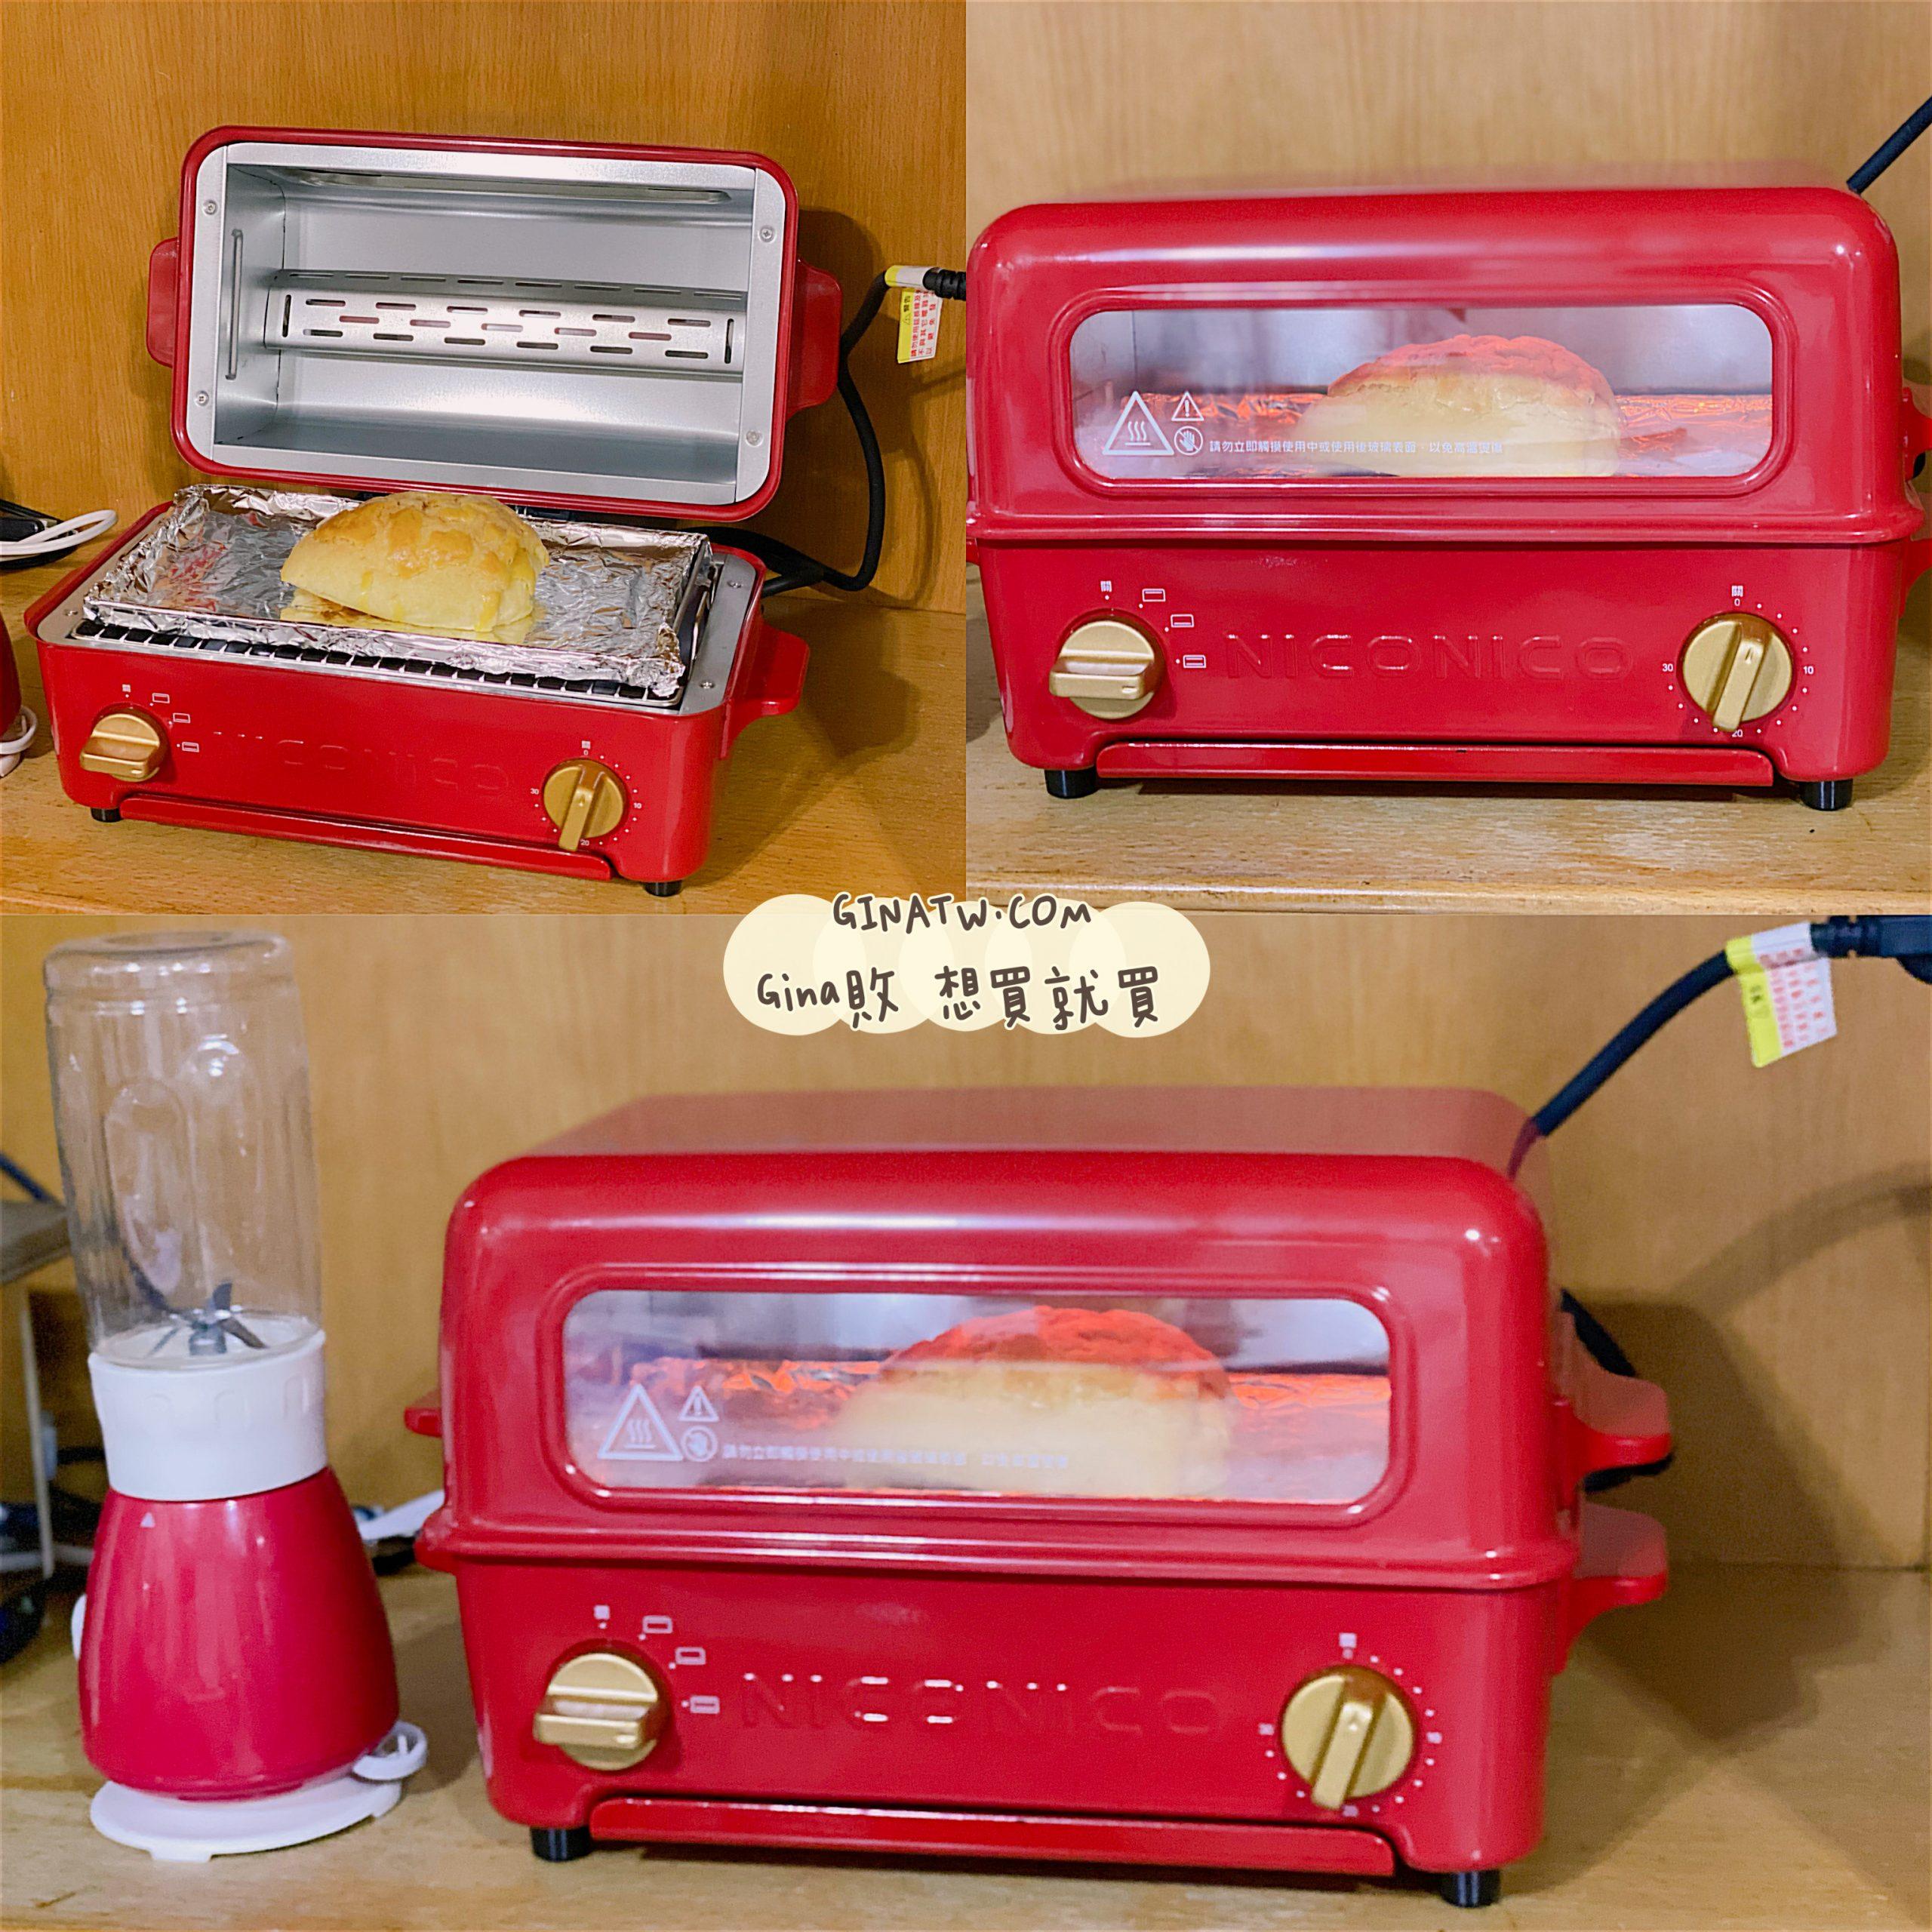 NICONICO掀蓋燒烤式蒸氣烤箱NI-S805|焗烤雞腿排、烤厚片土司、菠蘿油麵包 @GINA環球旅行生活|不會韓文也可以去韓國